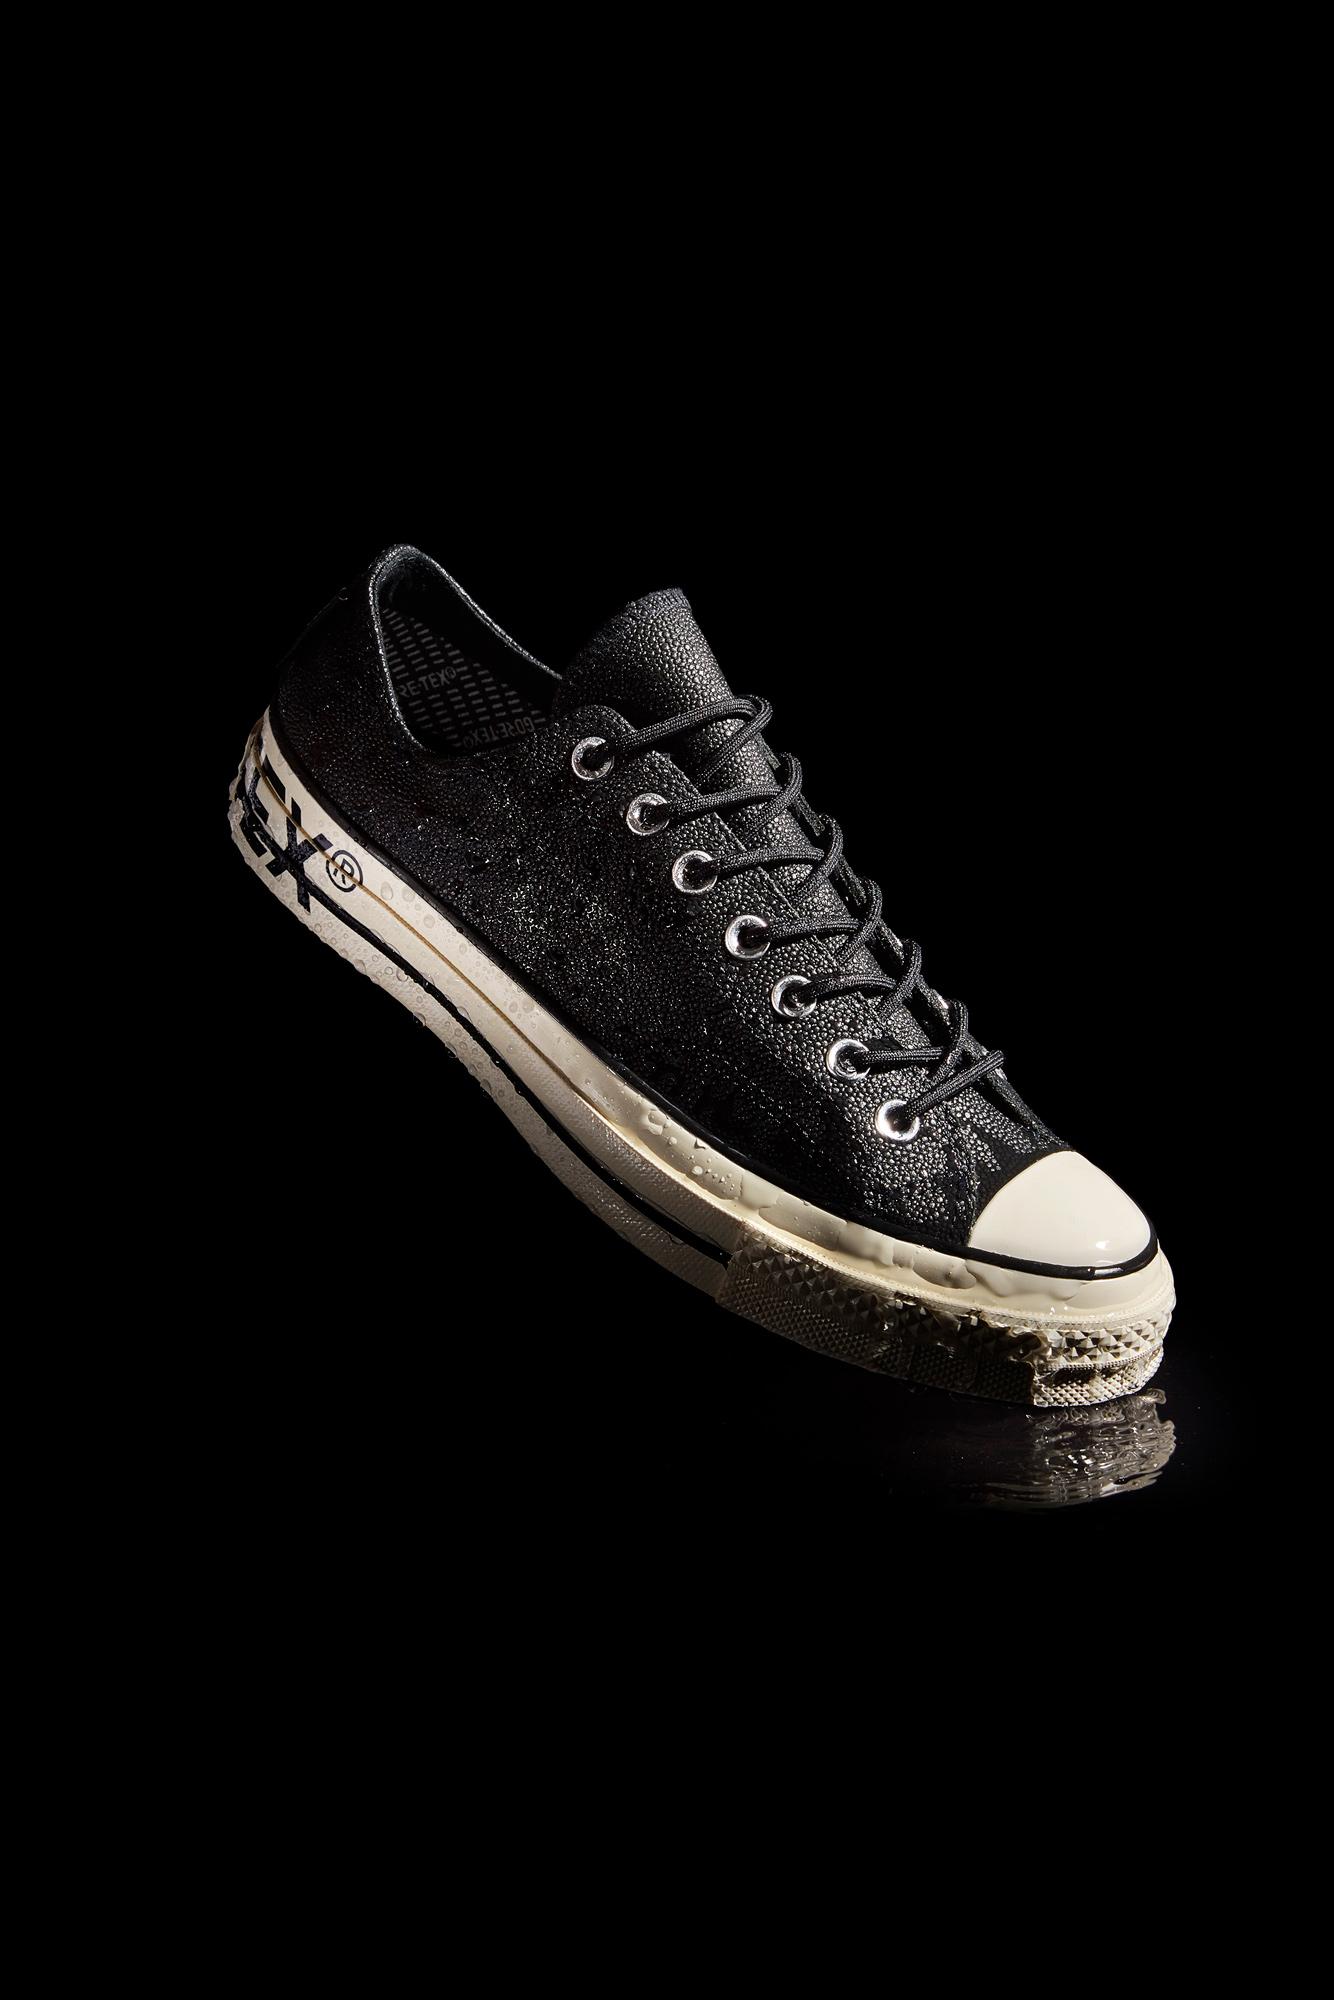 Converse GORE-TEX SS19